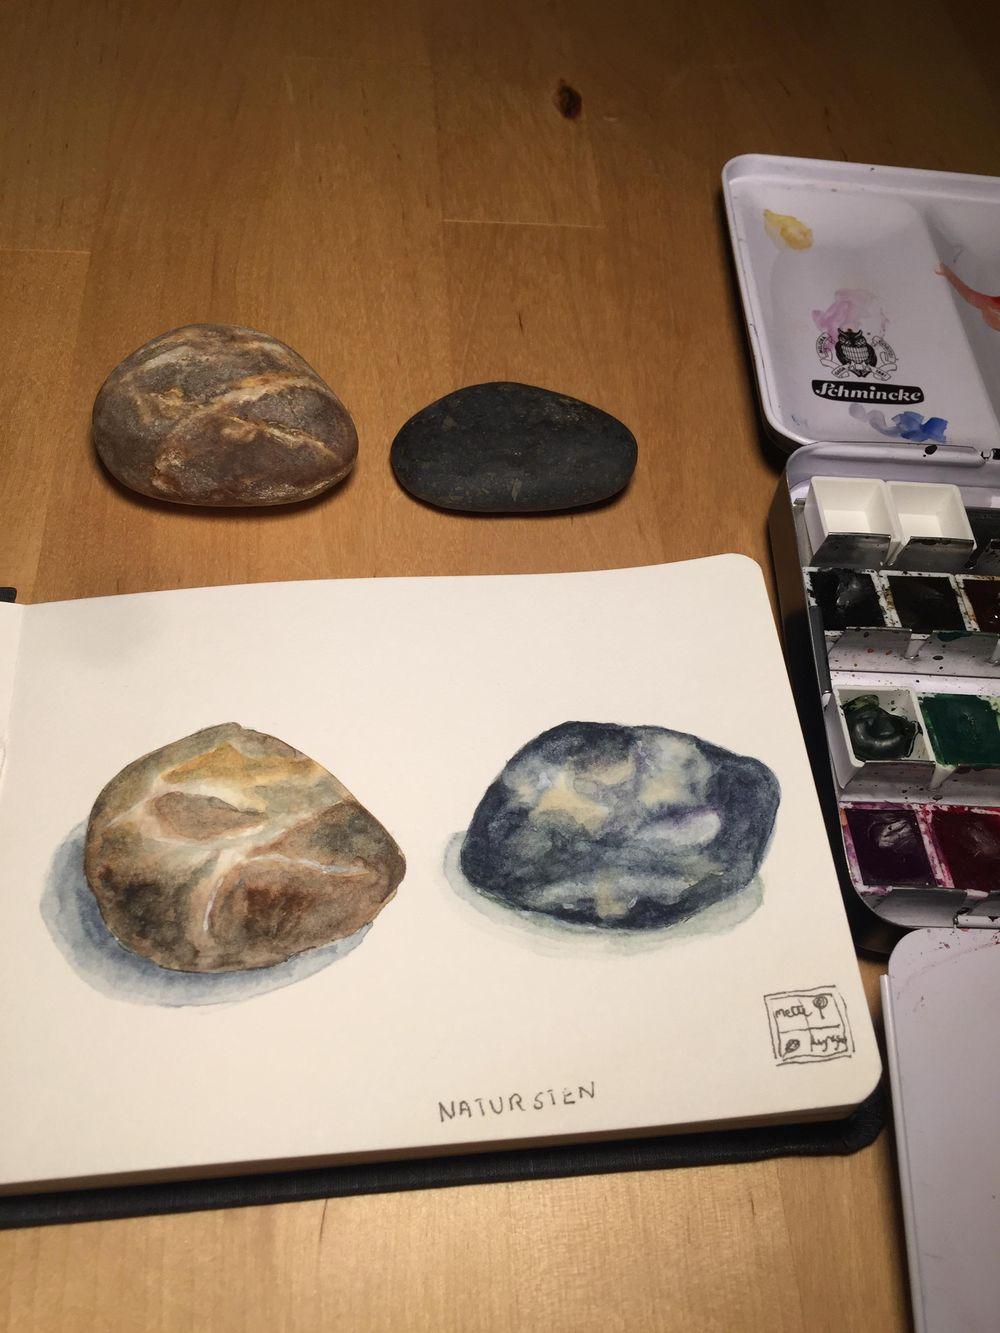 Natur sten - image 2 - student project